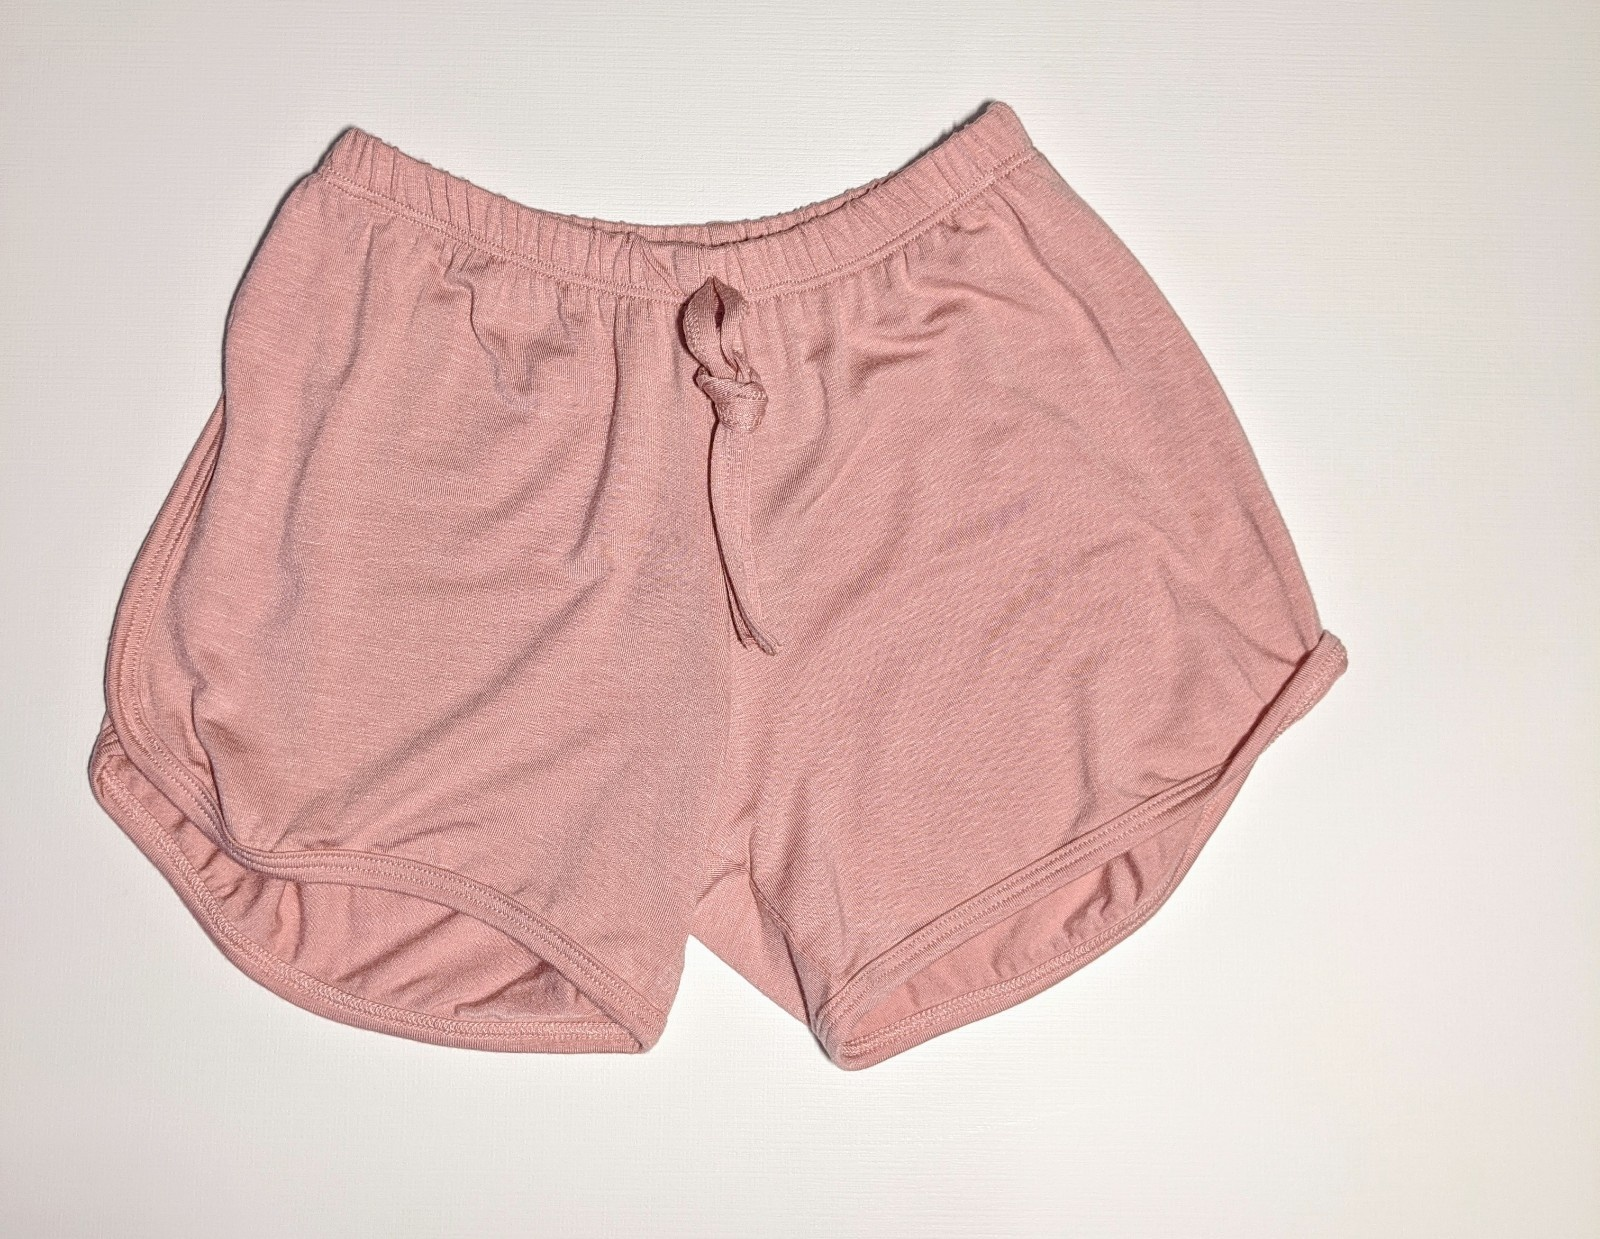 Area Code 407 Tween / Teen Knit Shorts